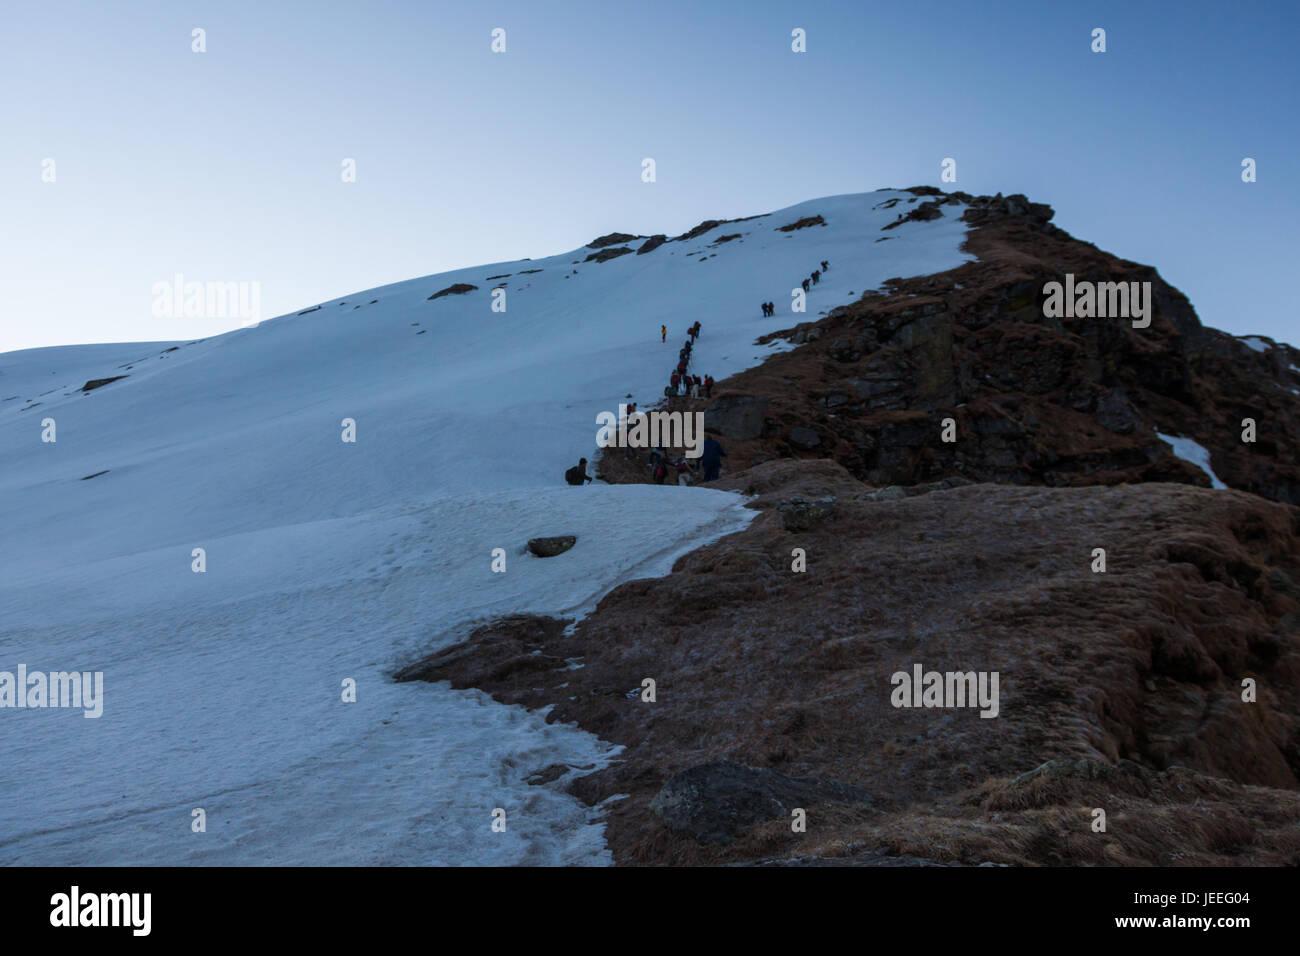 Group of trekkers hiking in Himalayas for Sarpass Trek in Kasol, Himachal Pradesh, India - Stock Image